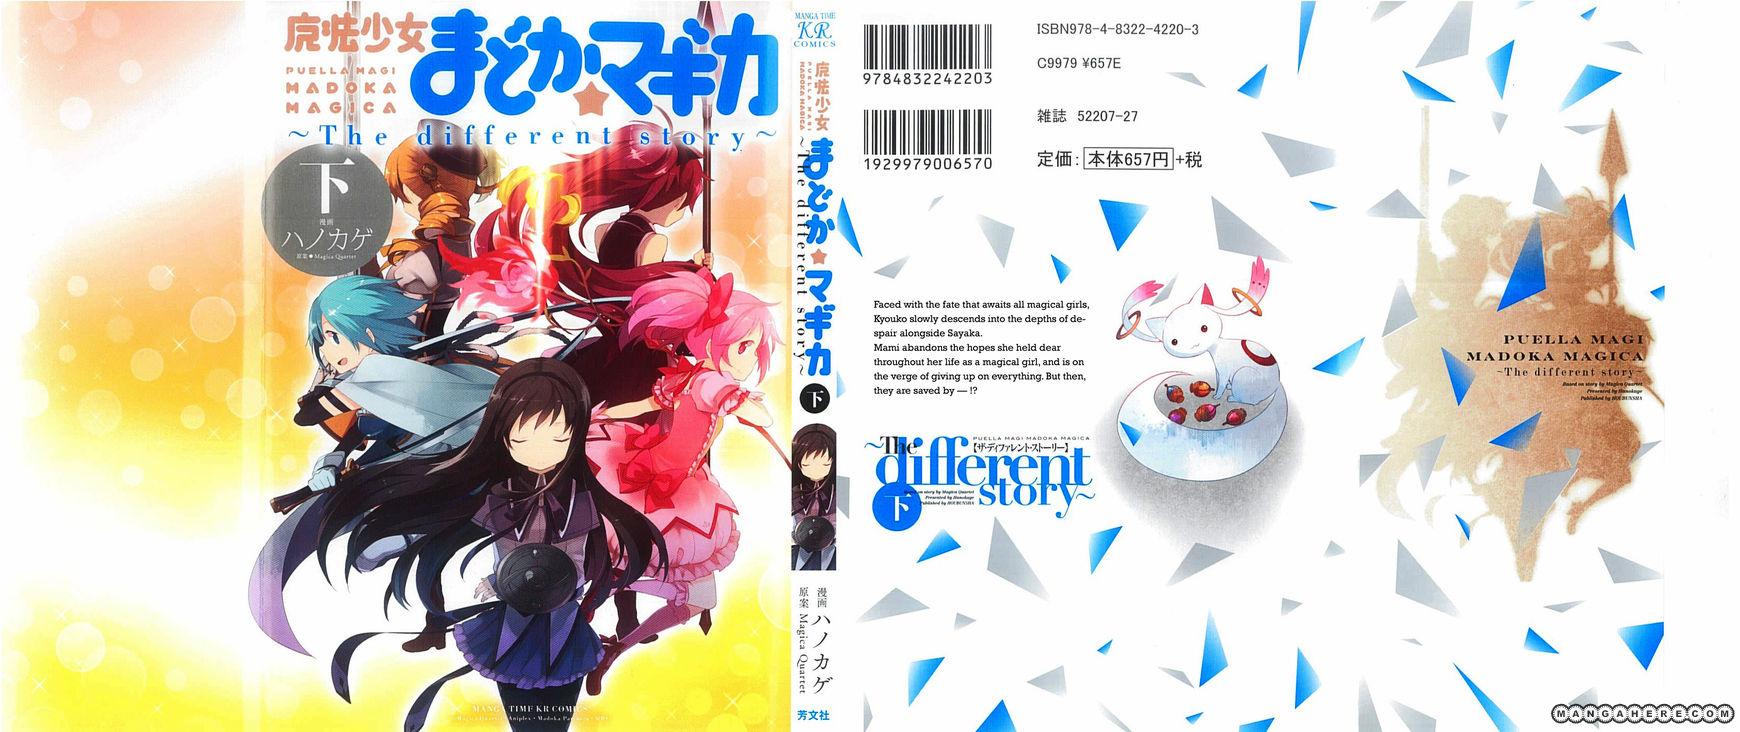 Mahou Shoujo Madoka Magica - The Different Story 9 Page 1